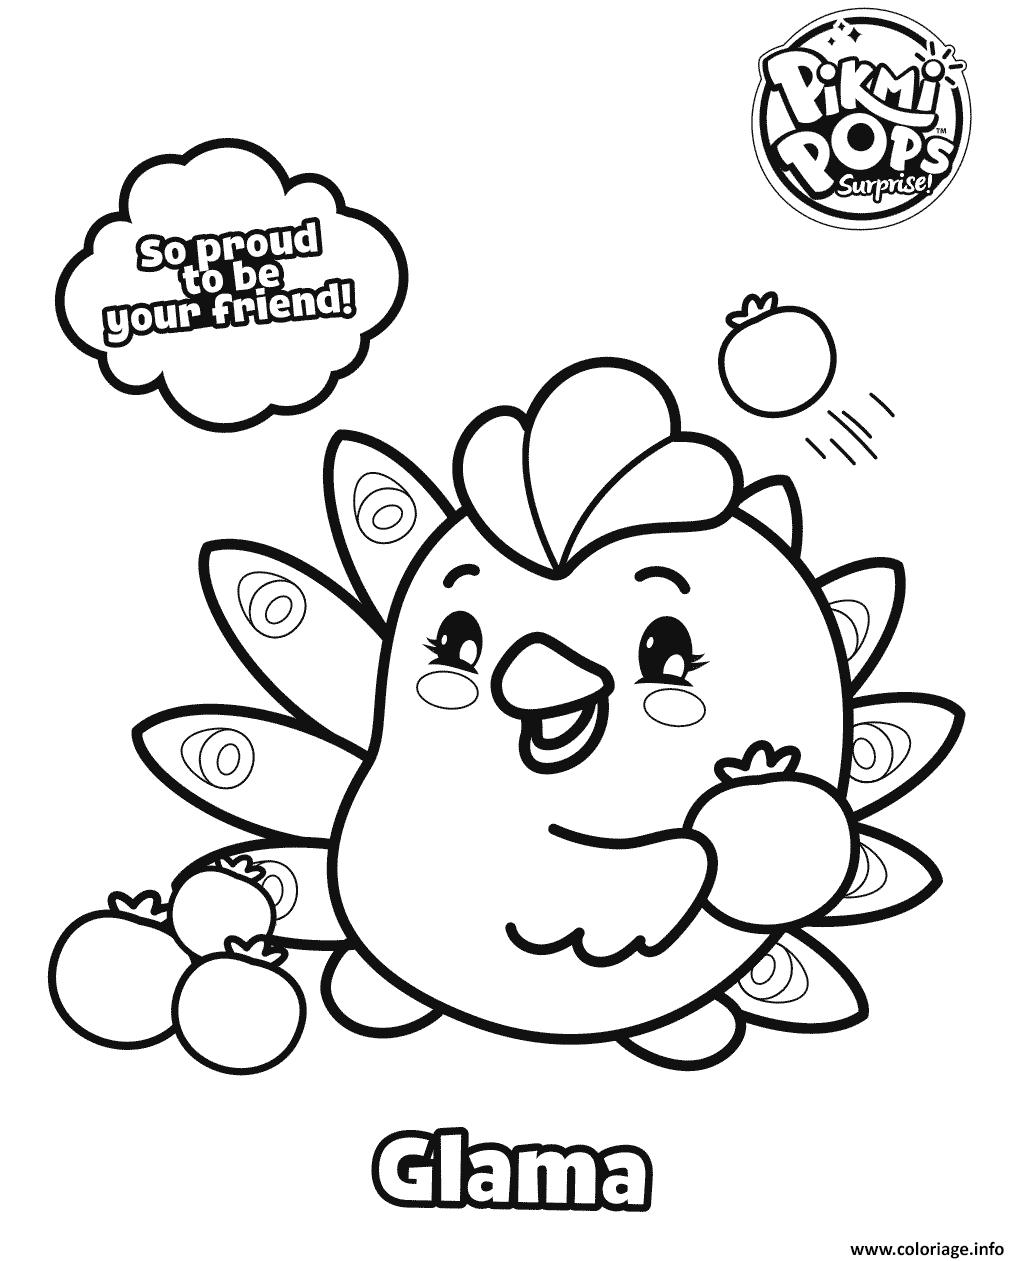 Dessin Pikmi Pops Glama Coloriage Gratuit à Imprimer